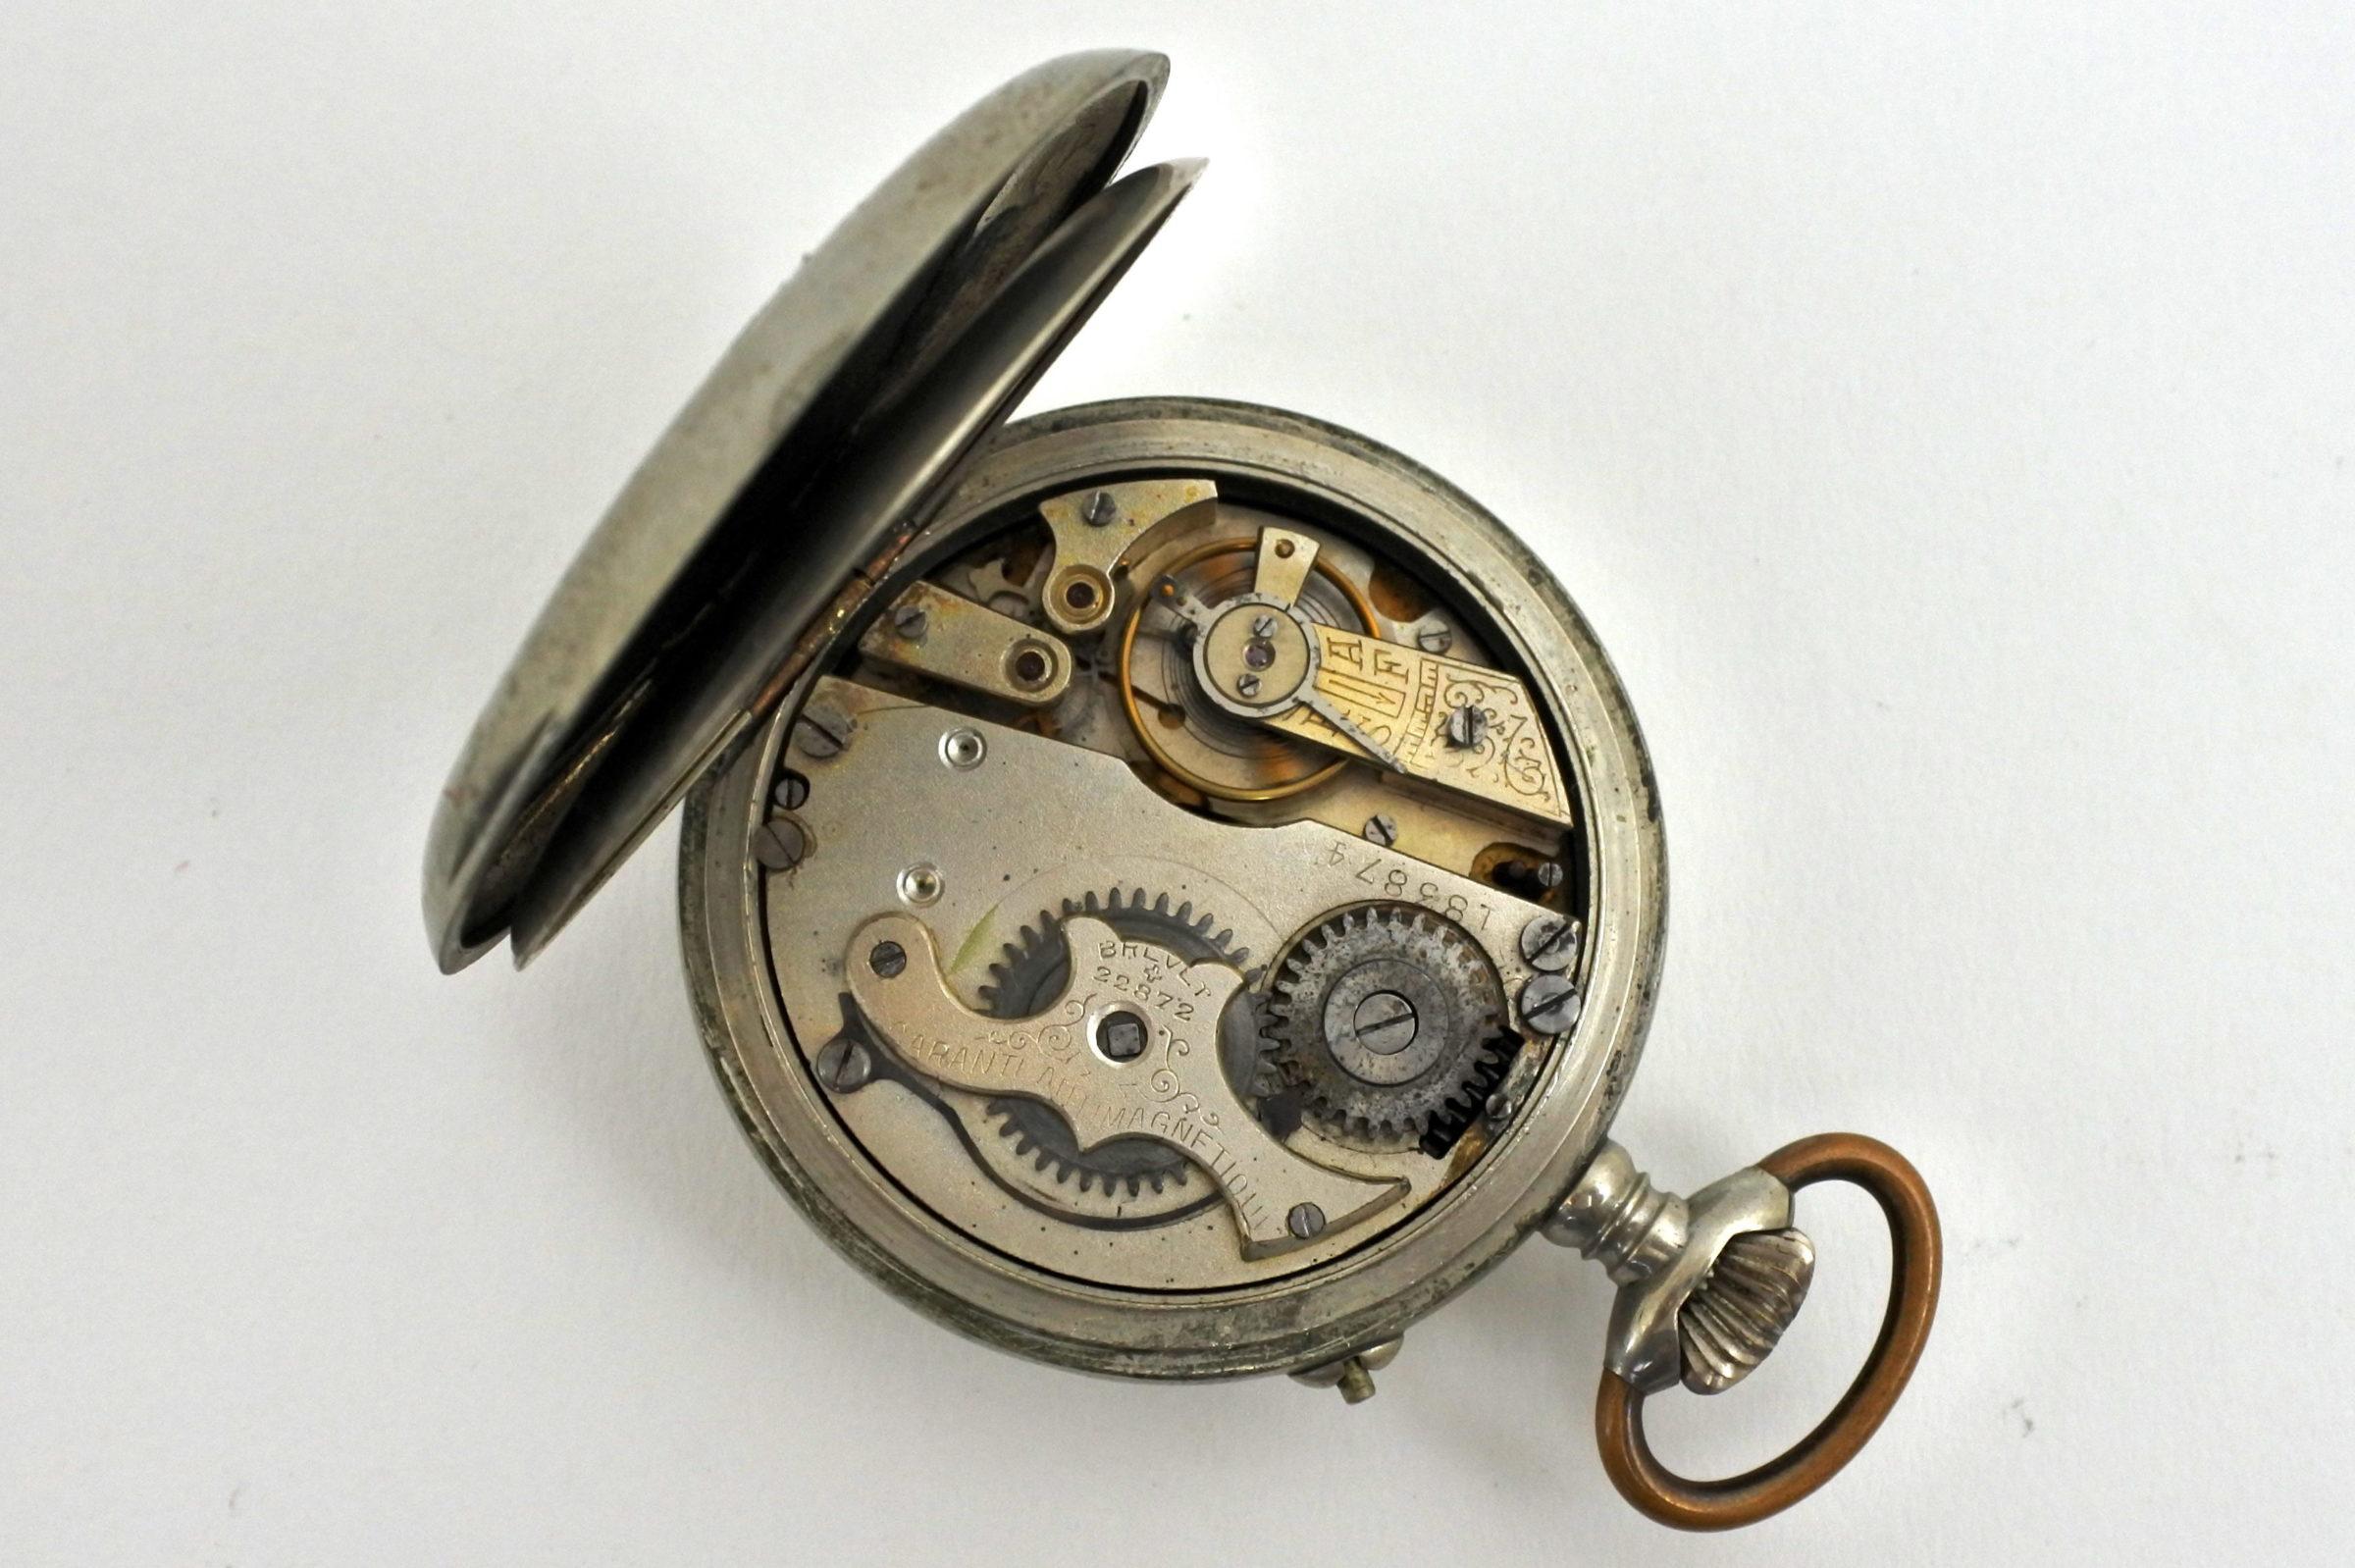 Orologio da tasca Cortebert superieure breveté - 3